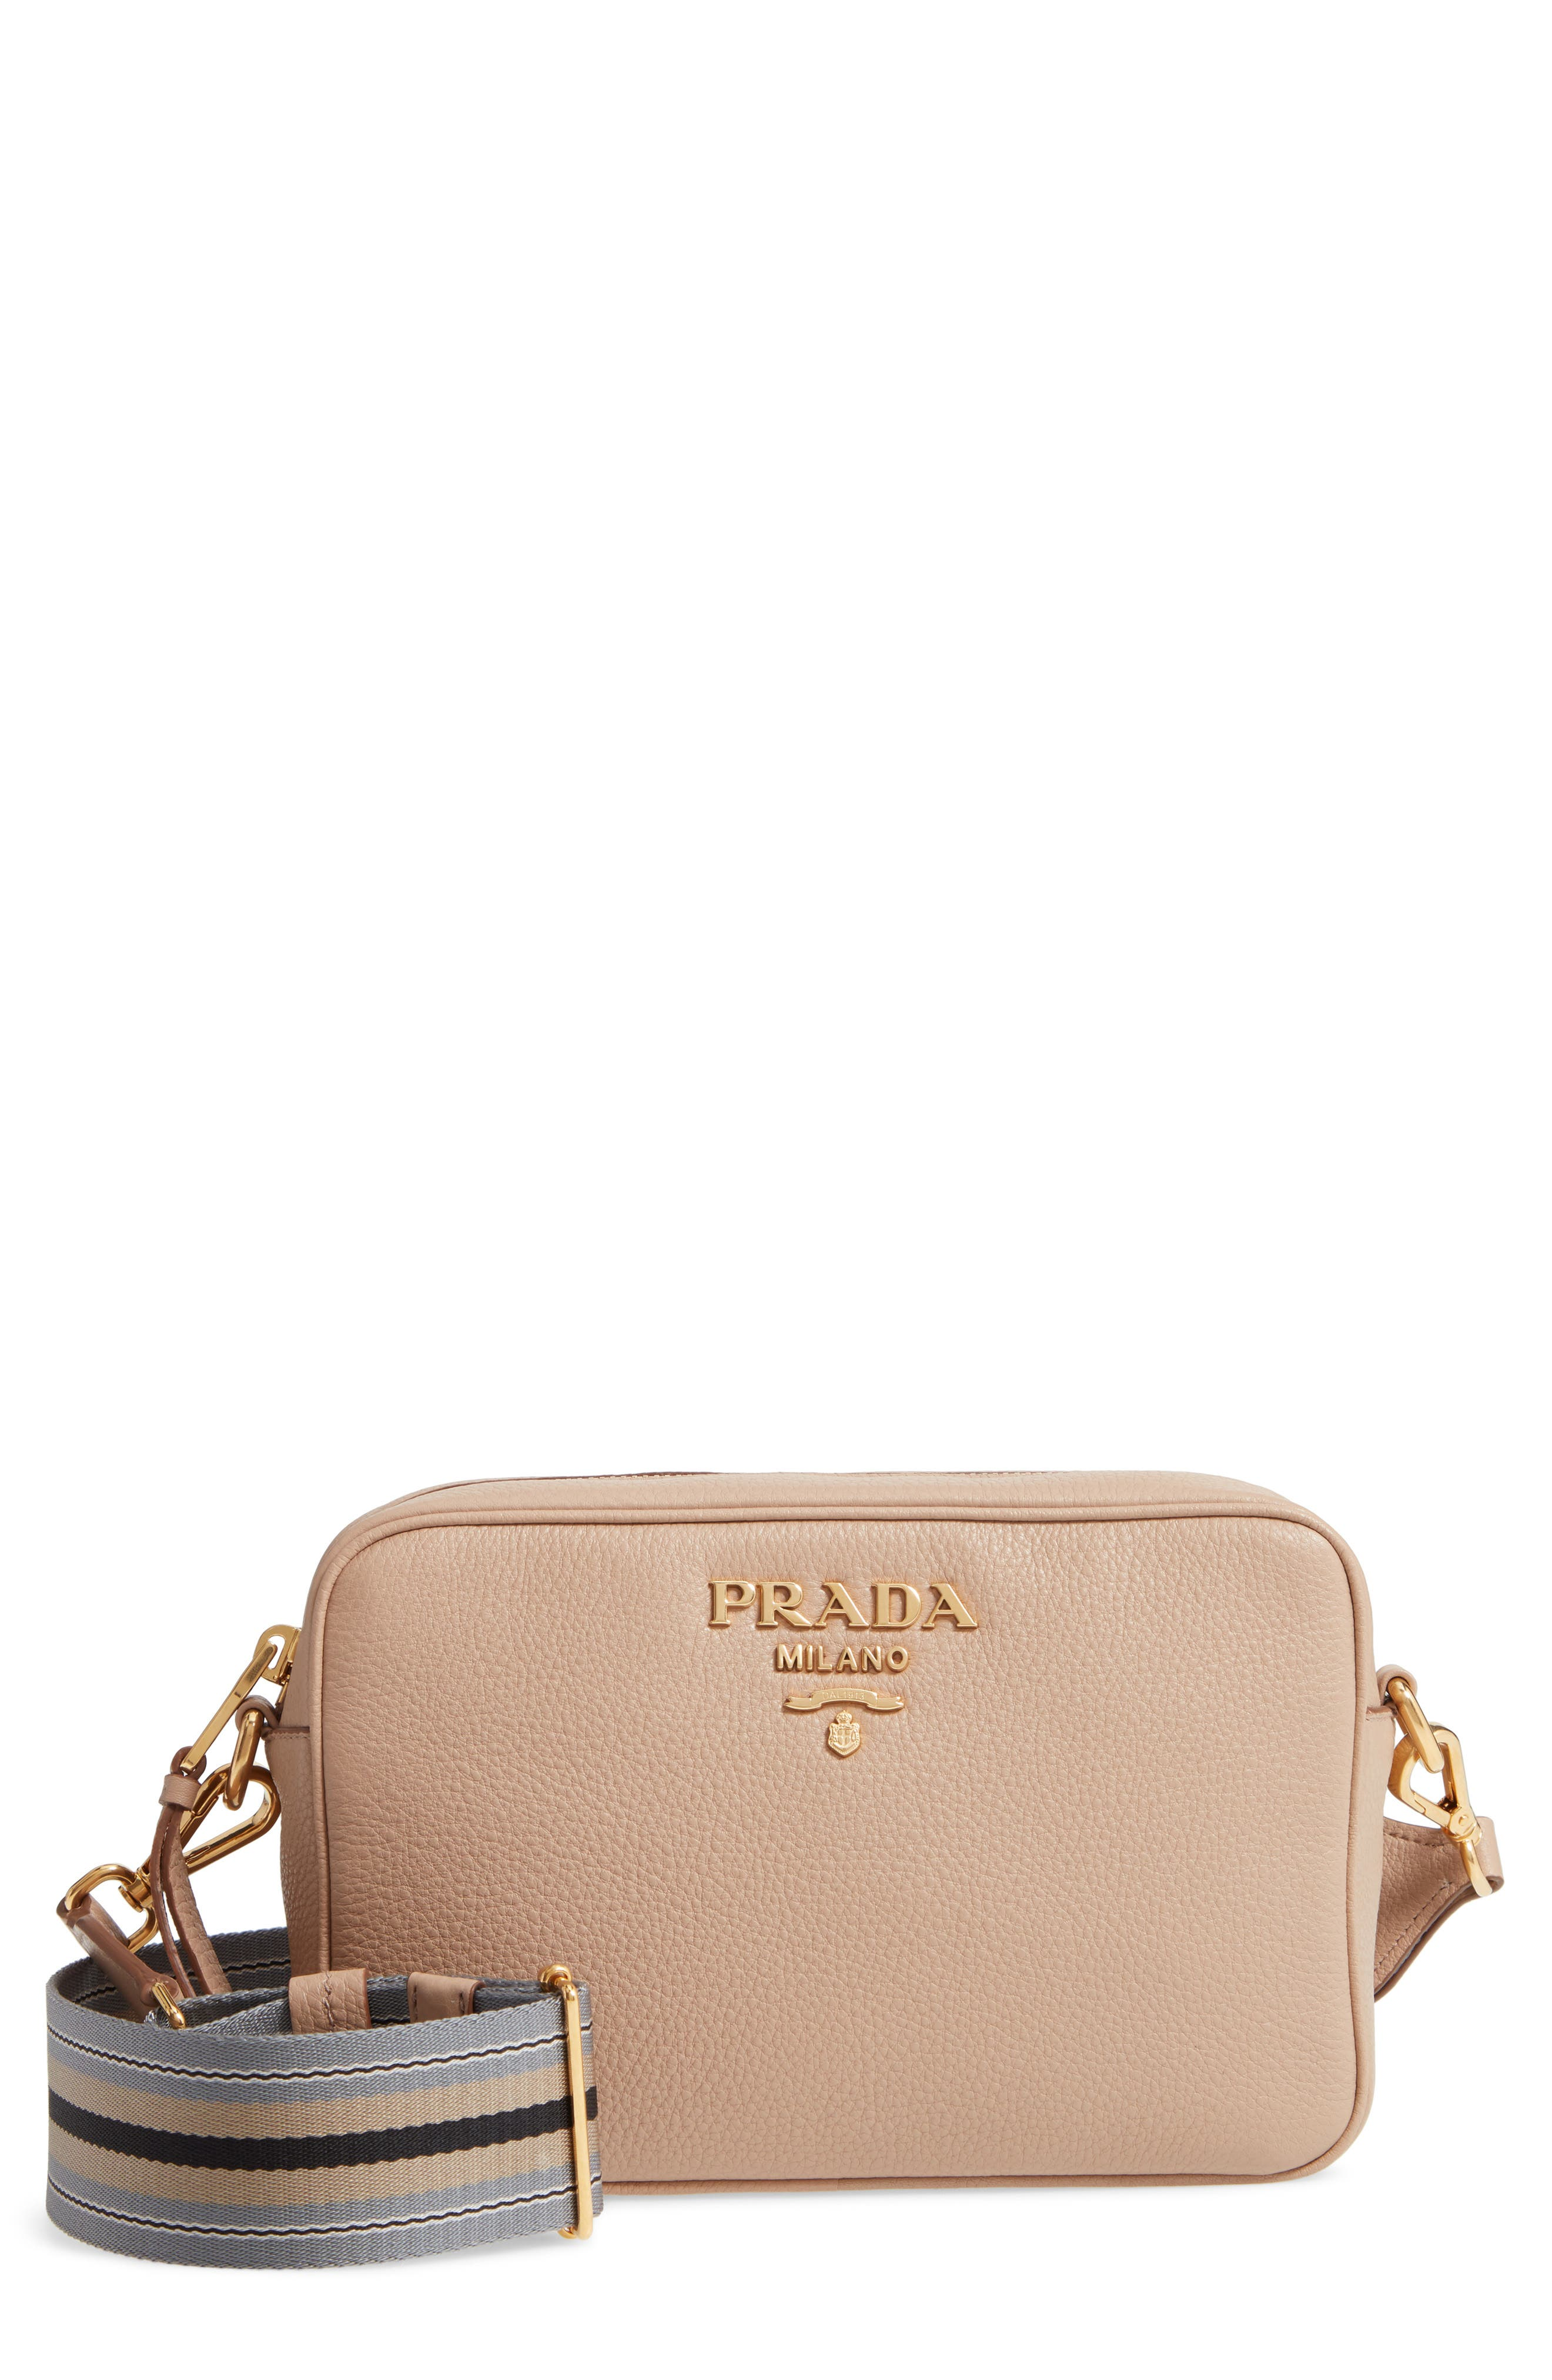 56c981943204d7 ... coupon code for prada vitello daino leather camera bag abf3c bc710